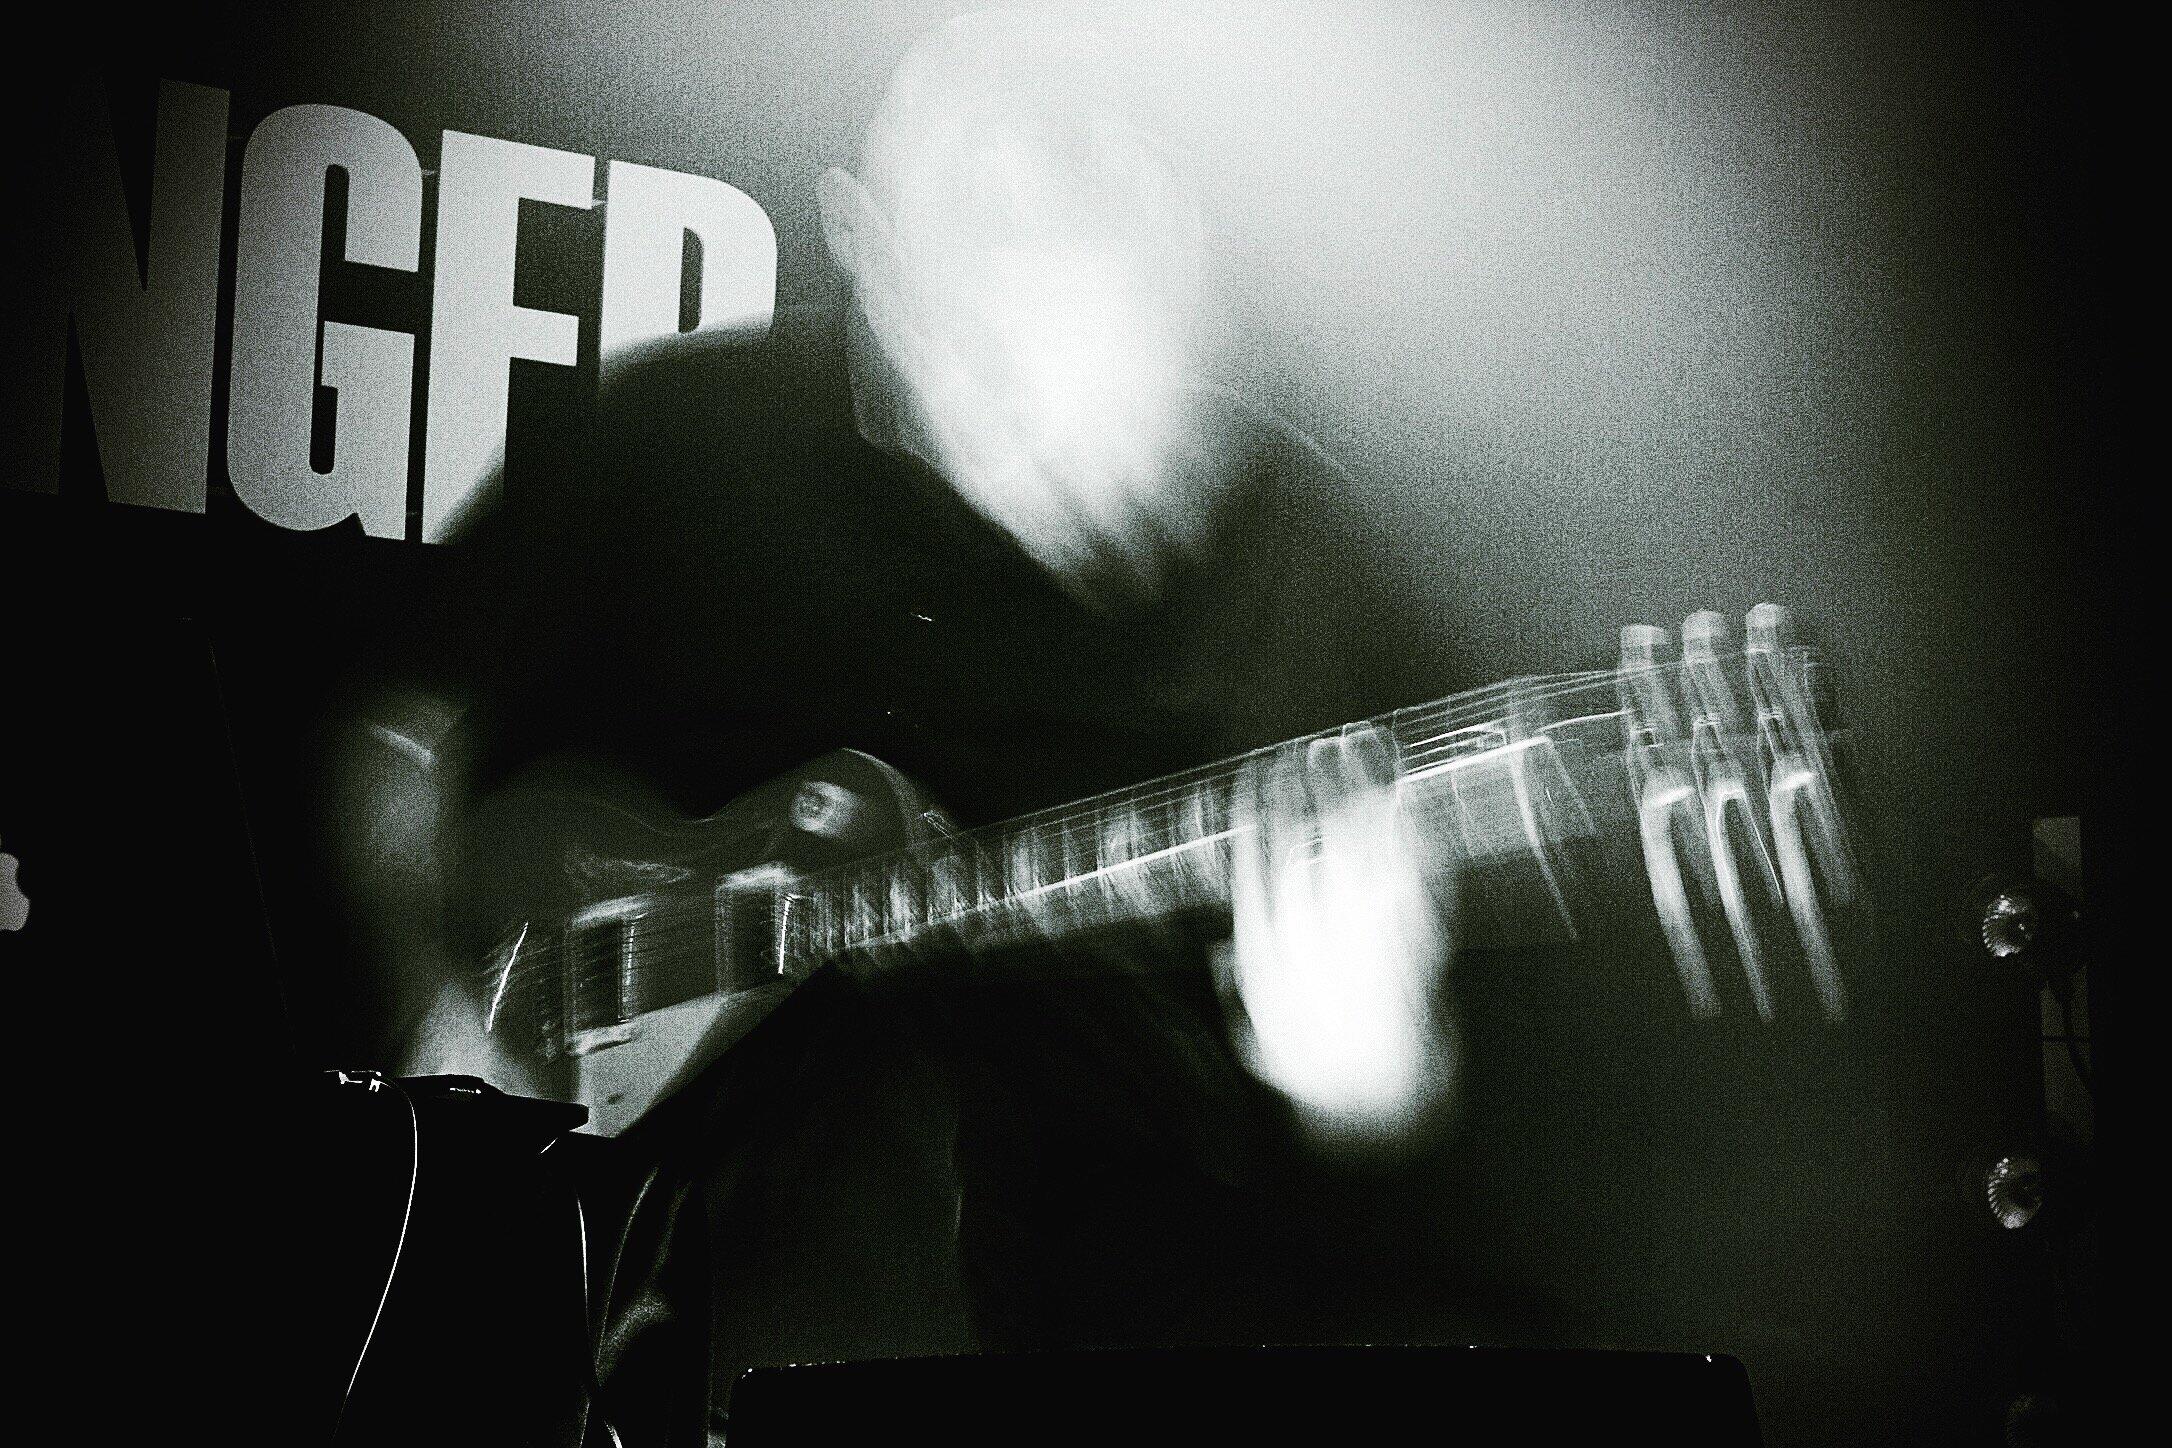 Photo by Shaun Cullen